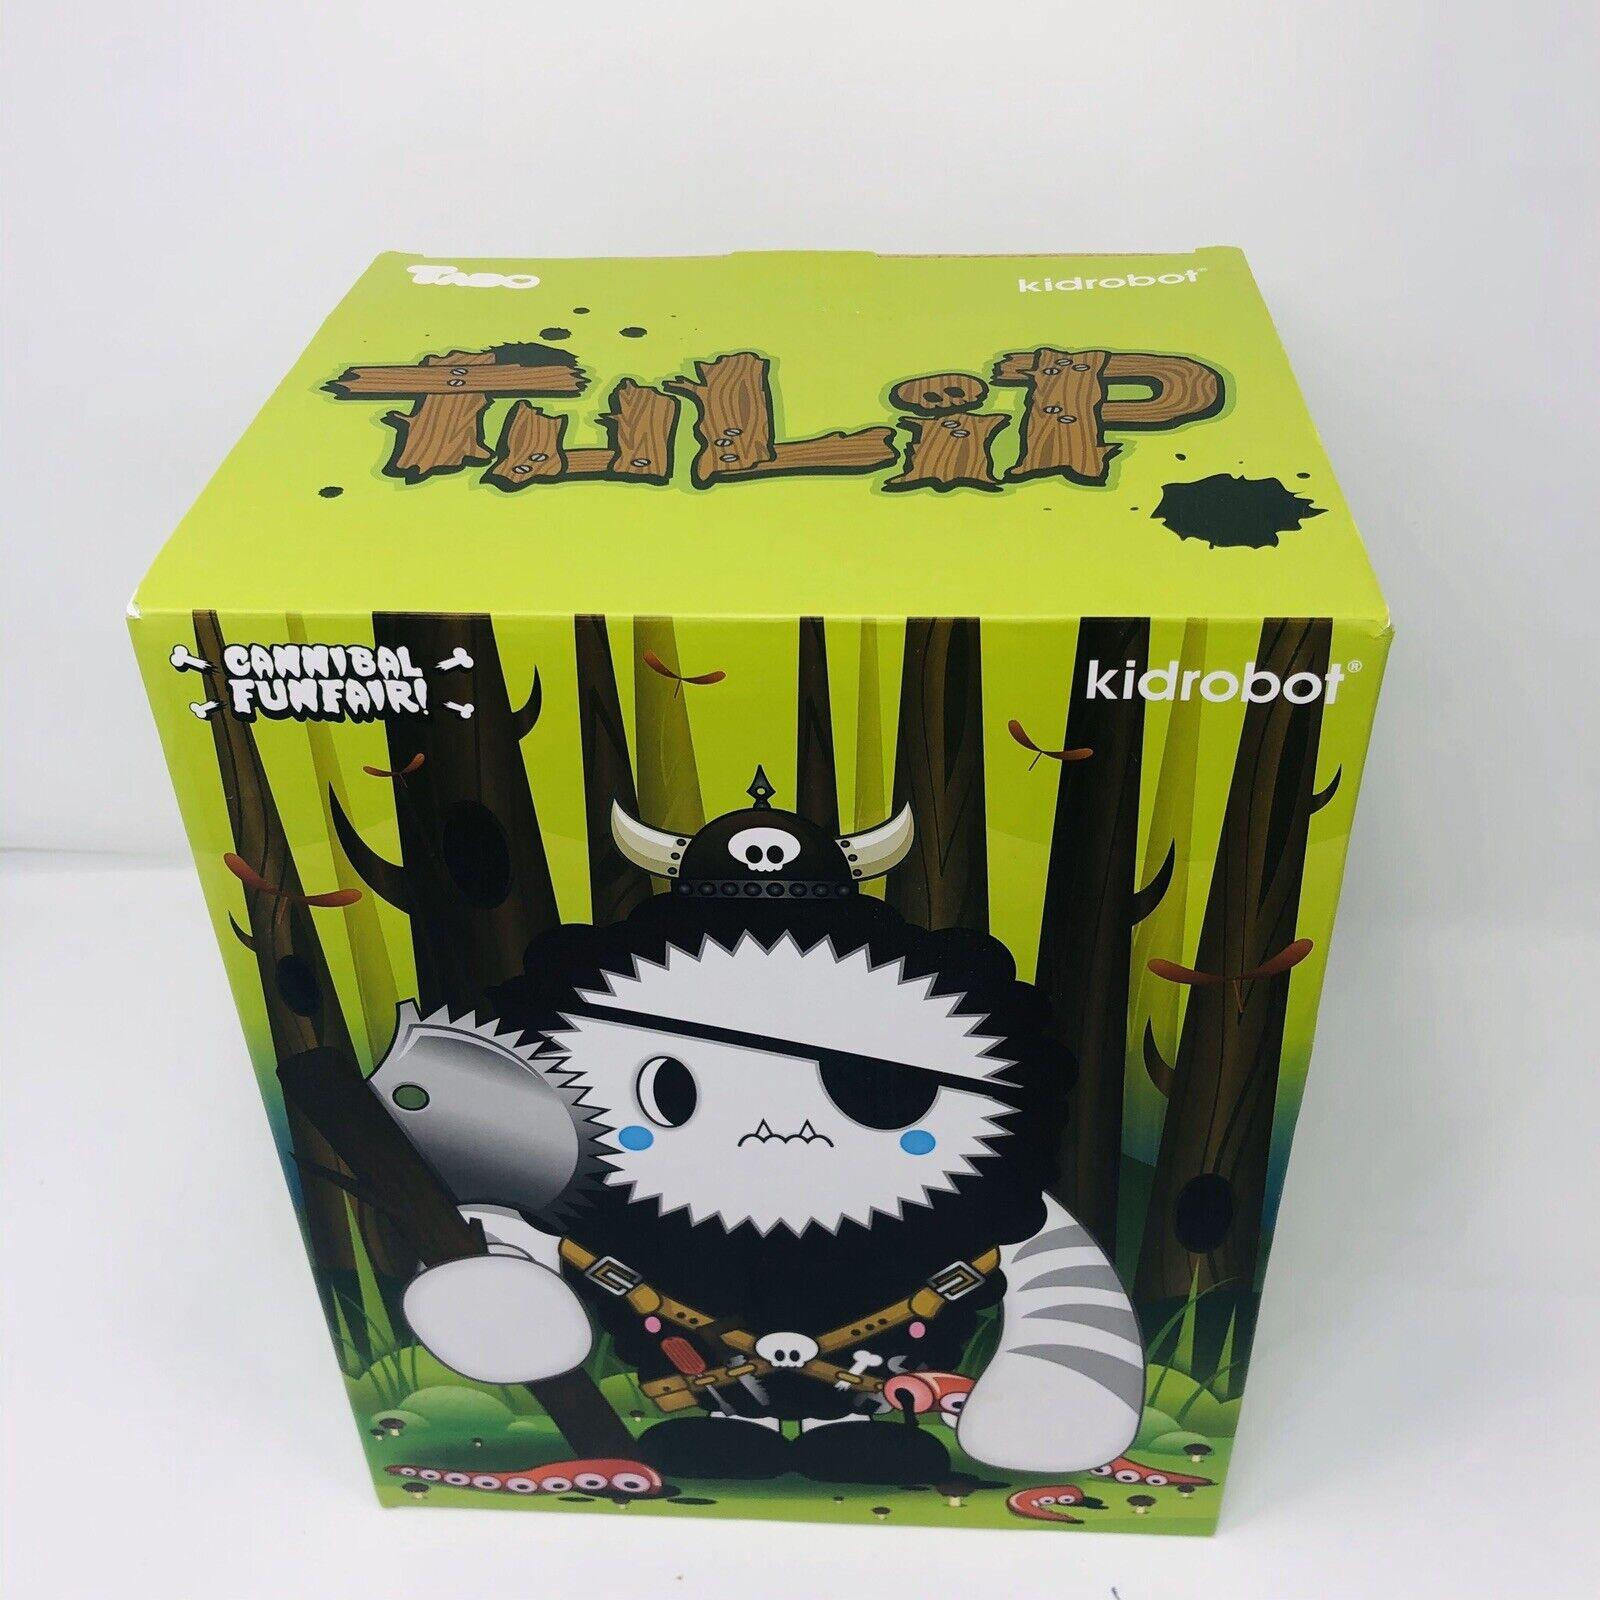 Kidrobot Tulip 7  Large Figure By TADO Cannibal Funfair 2008 New Open Box